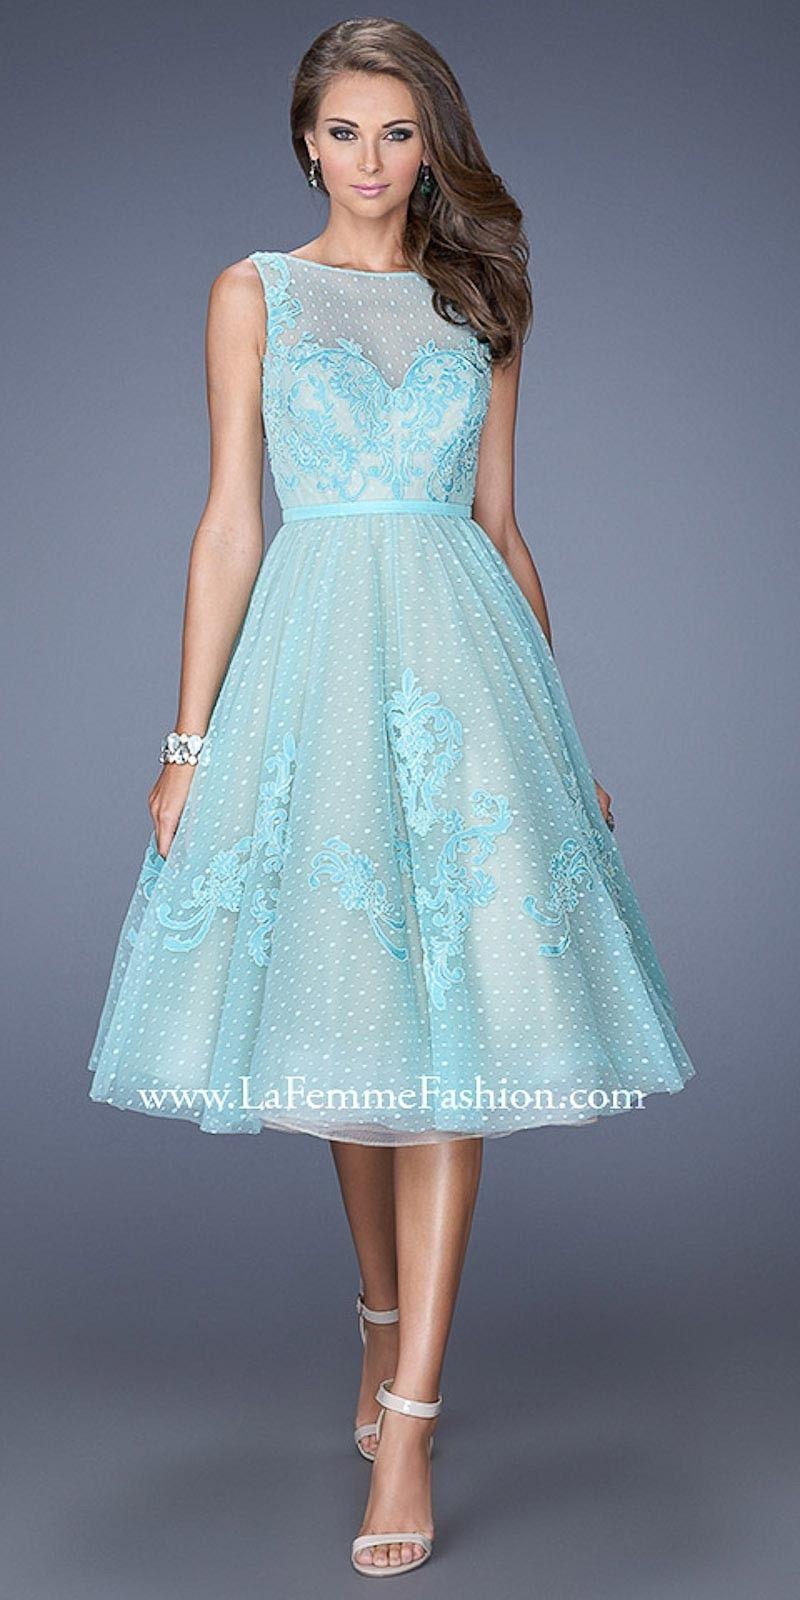 Comfortable Party Dress Midi Ideas - Wedding Ideas - memiocall.com